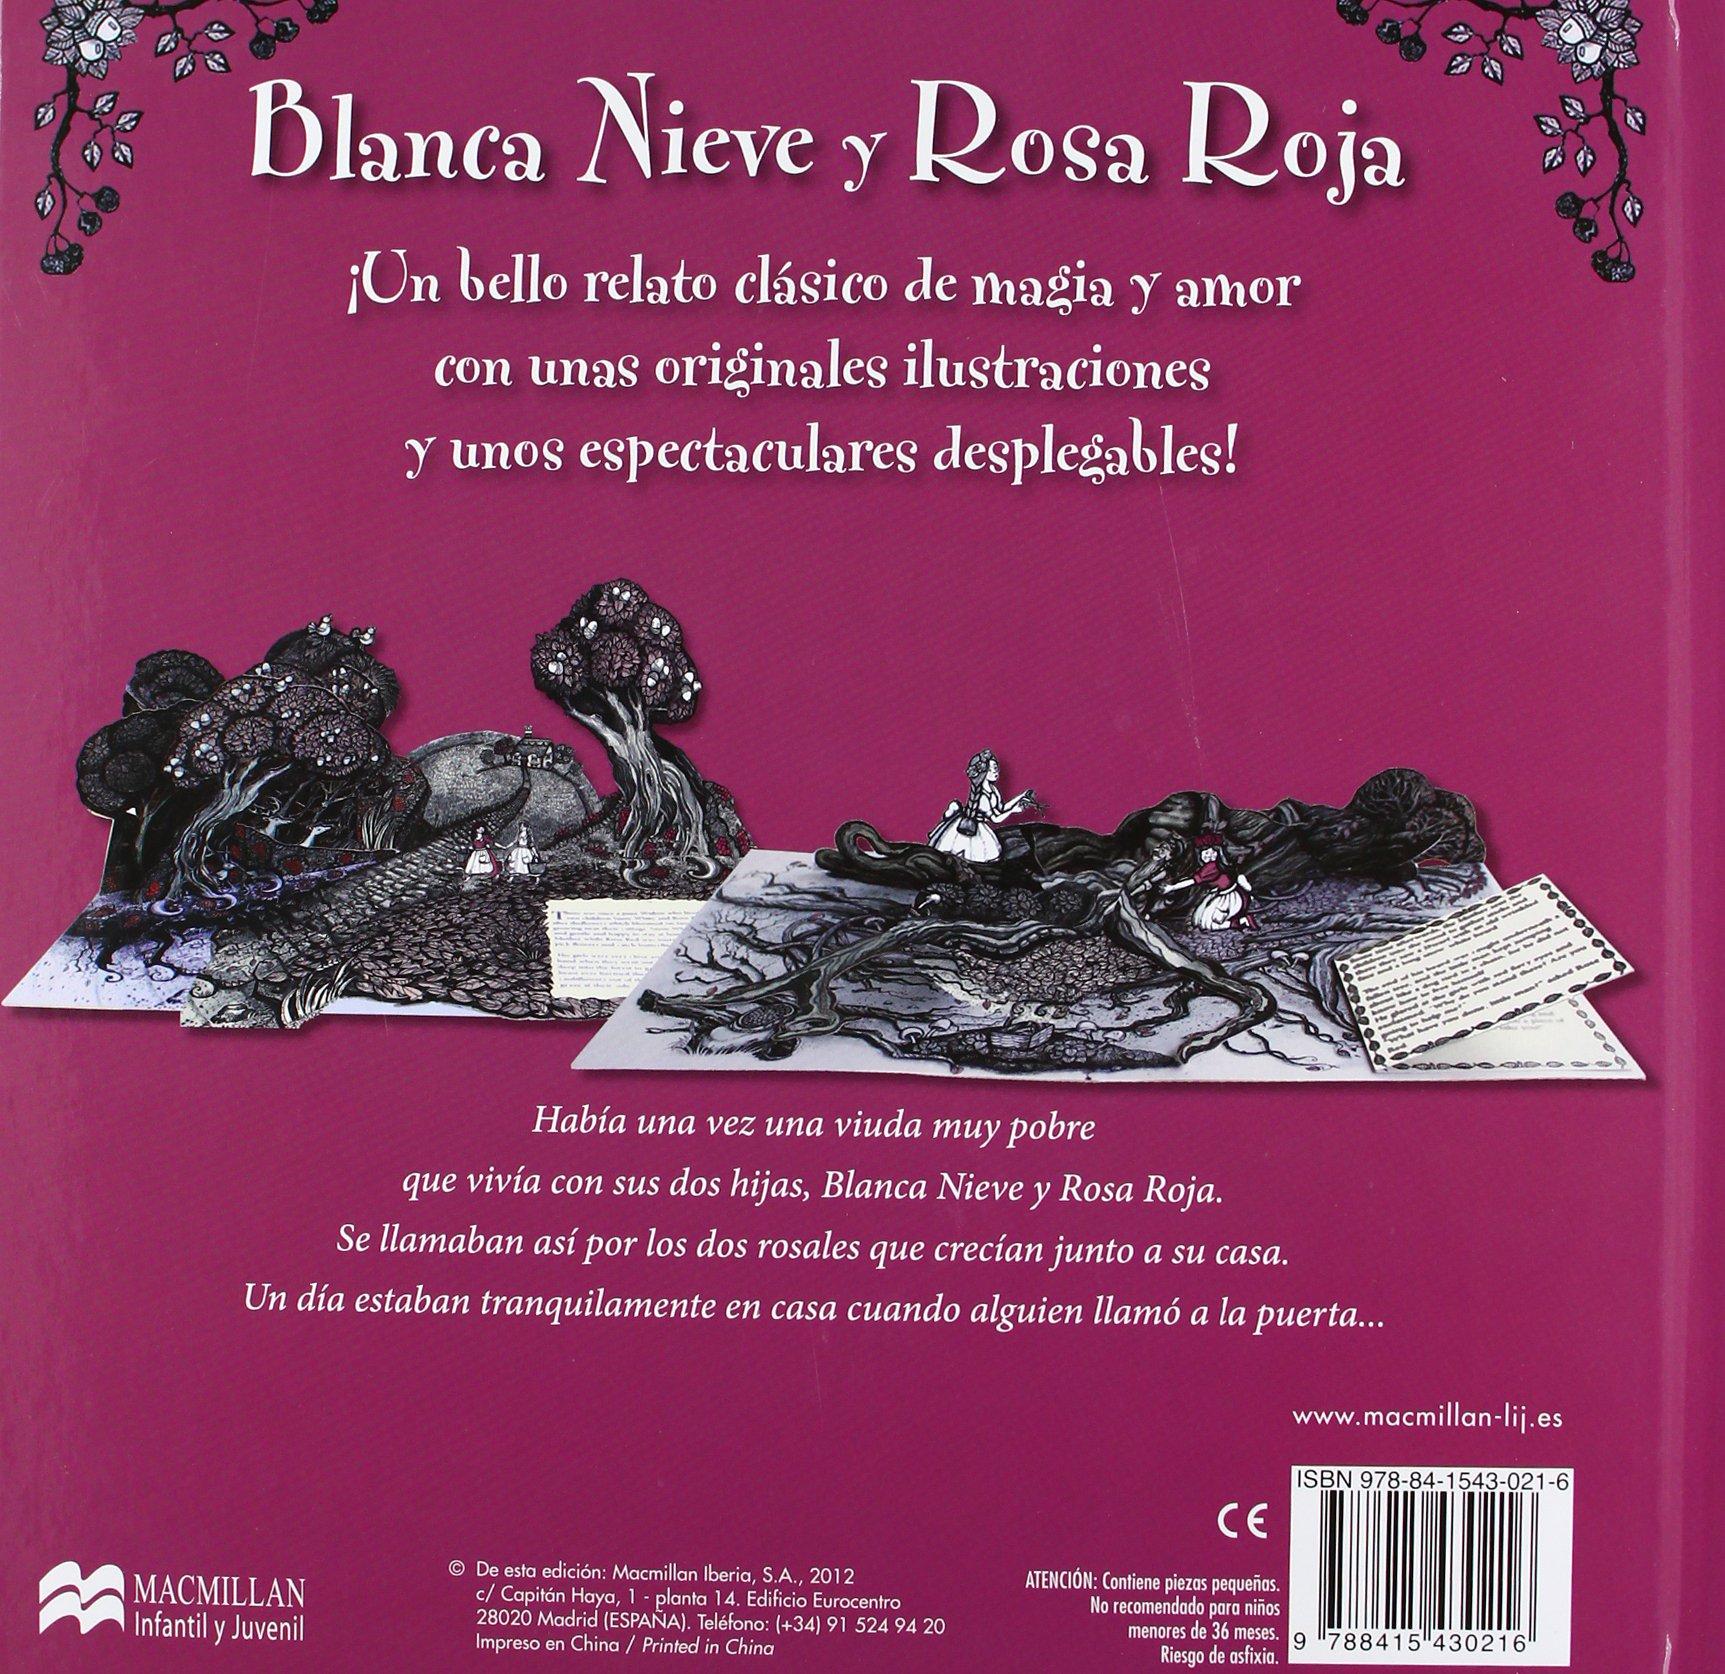 Blanca nieve y Rosa roja: Hermanos Grimm: 9788415430216: Amazon.com: Books